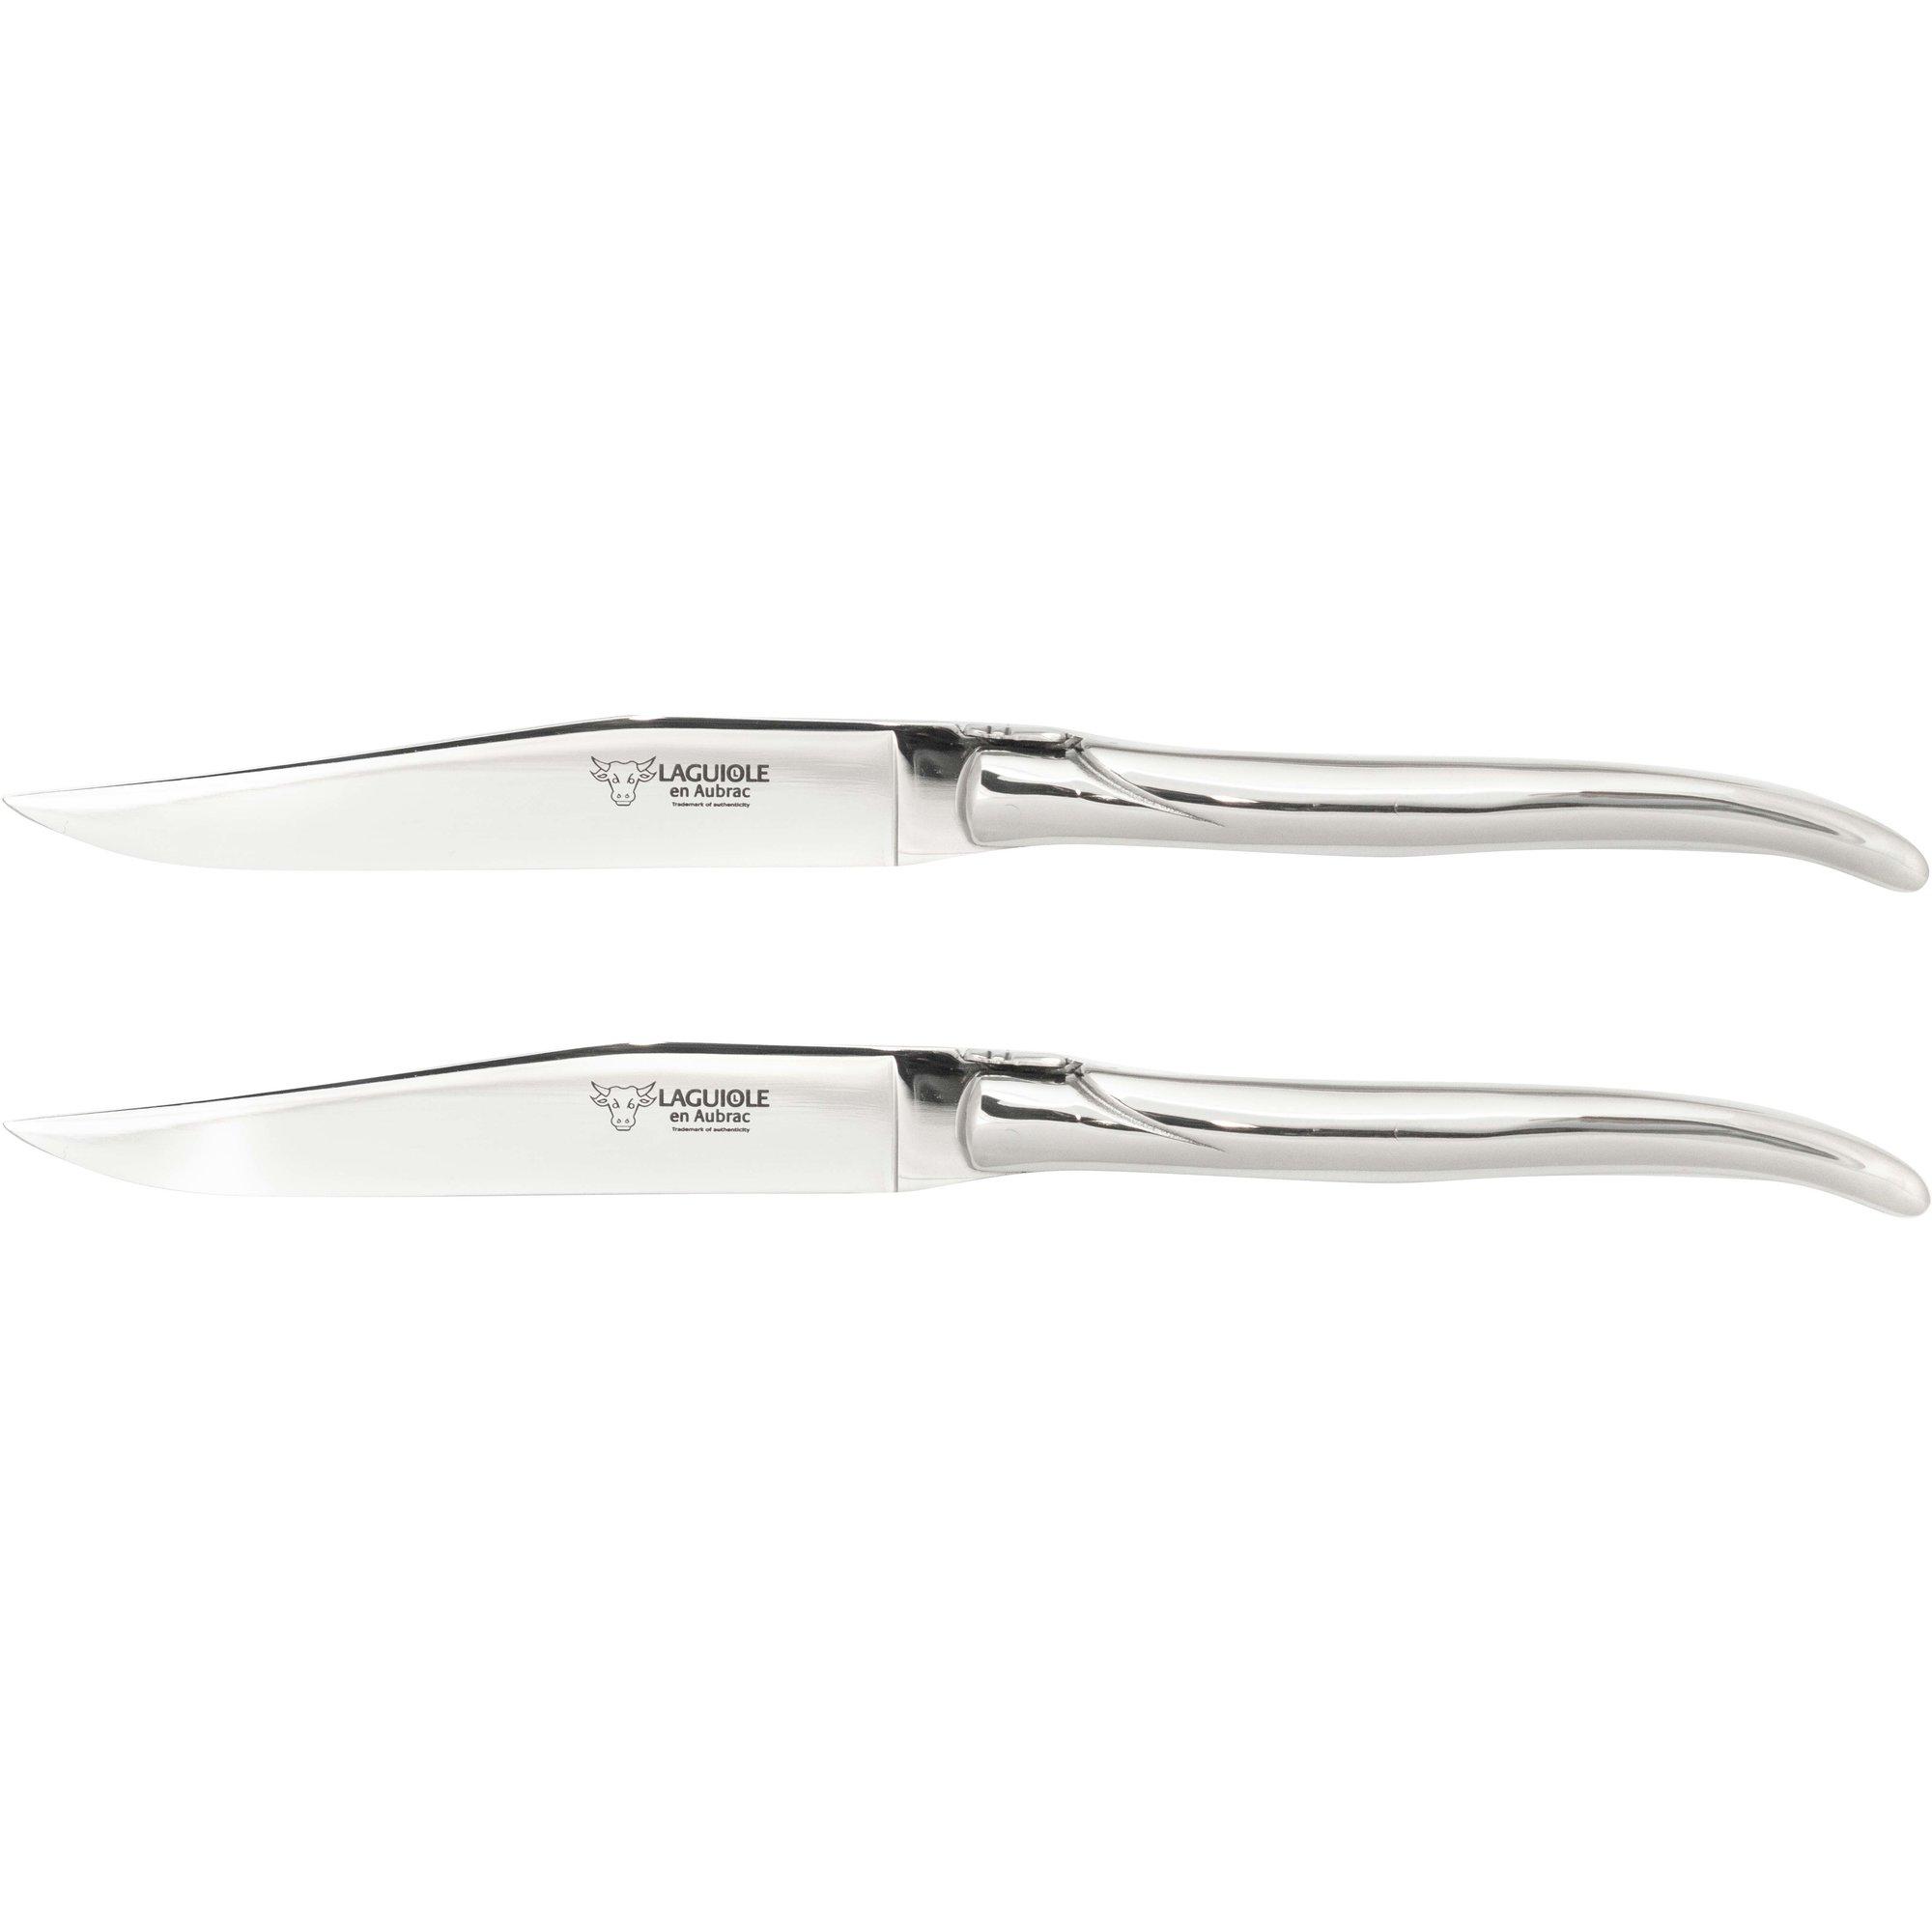 Laguiole Stekkniv 2 st blankt stål